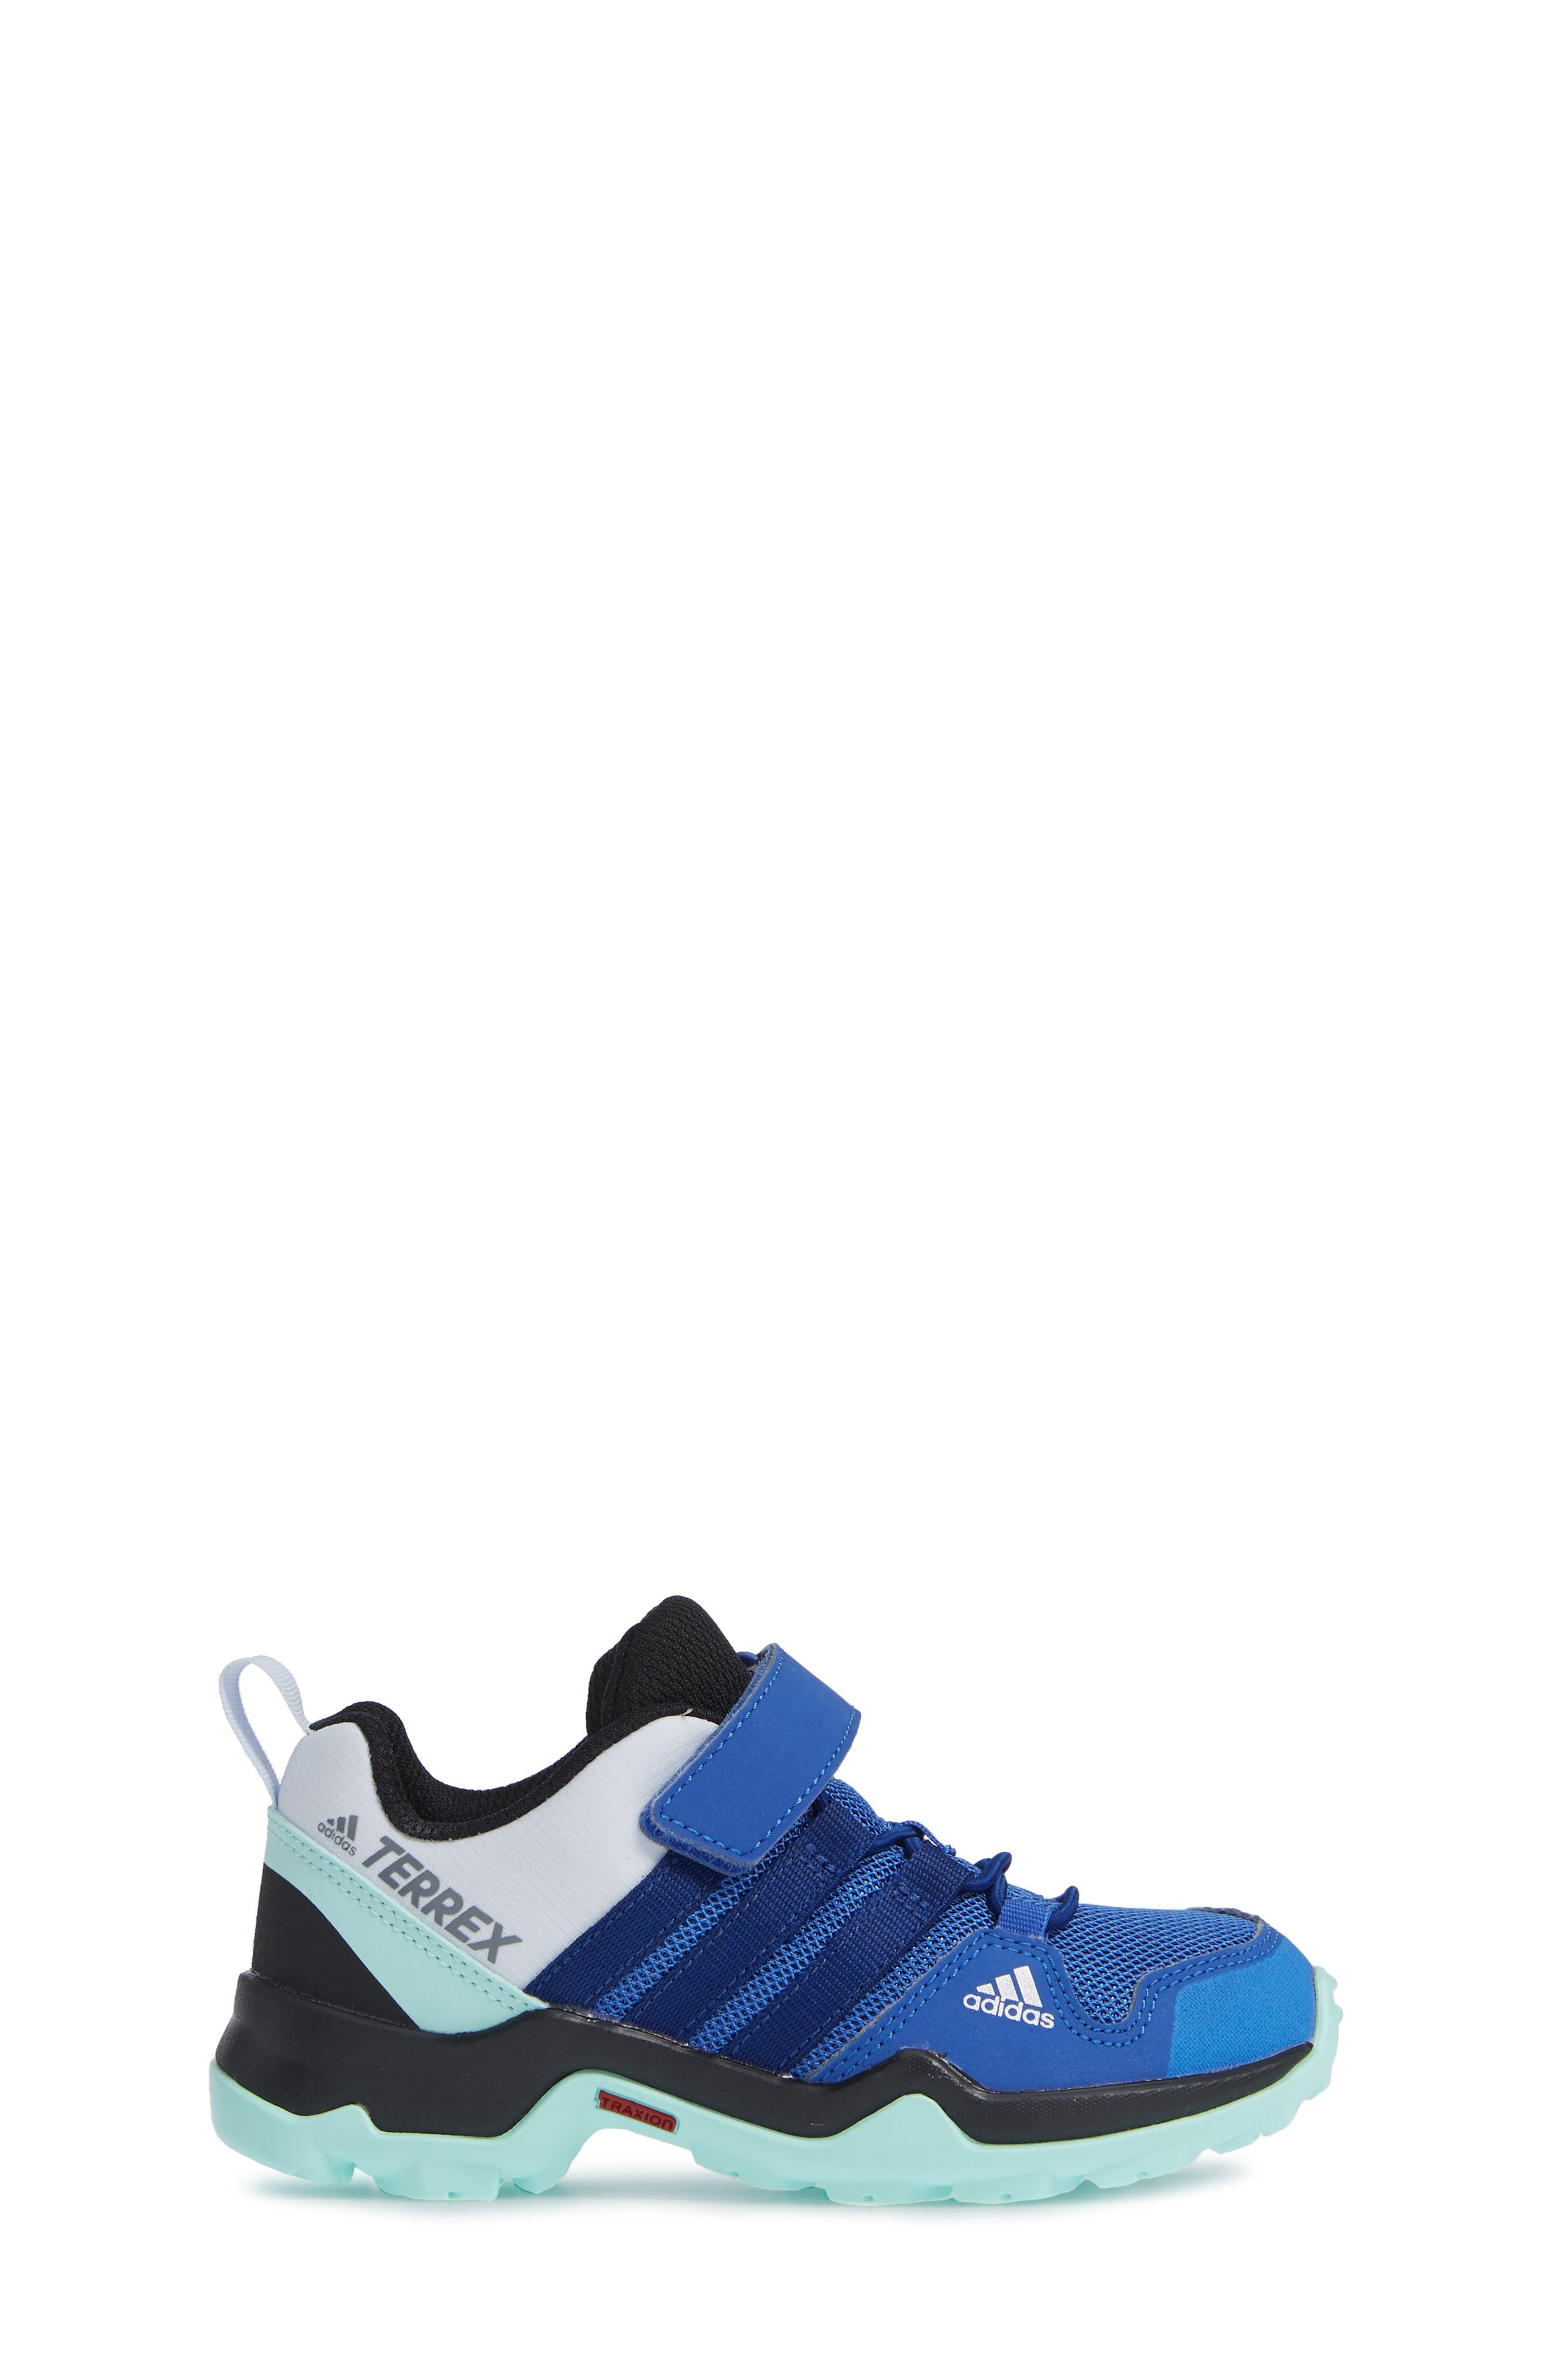 Terrex AX2R Sneaker,                             Alternate thumbnail 3, color,                             HI-RES BLUE/ MYSTERY INK/ MINT